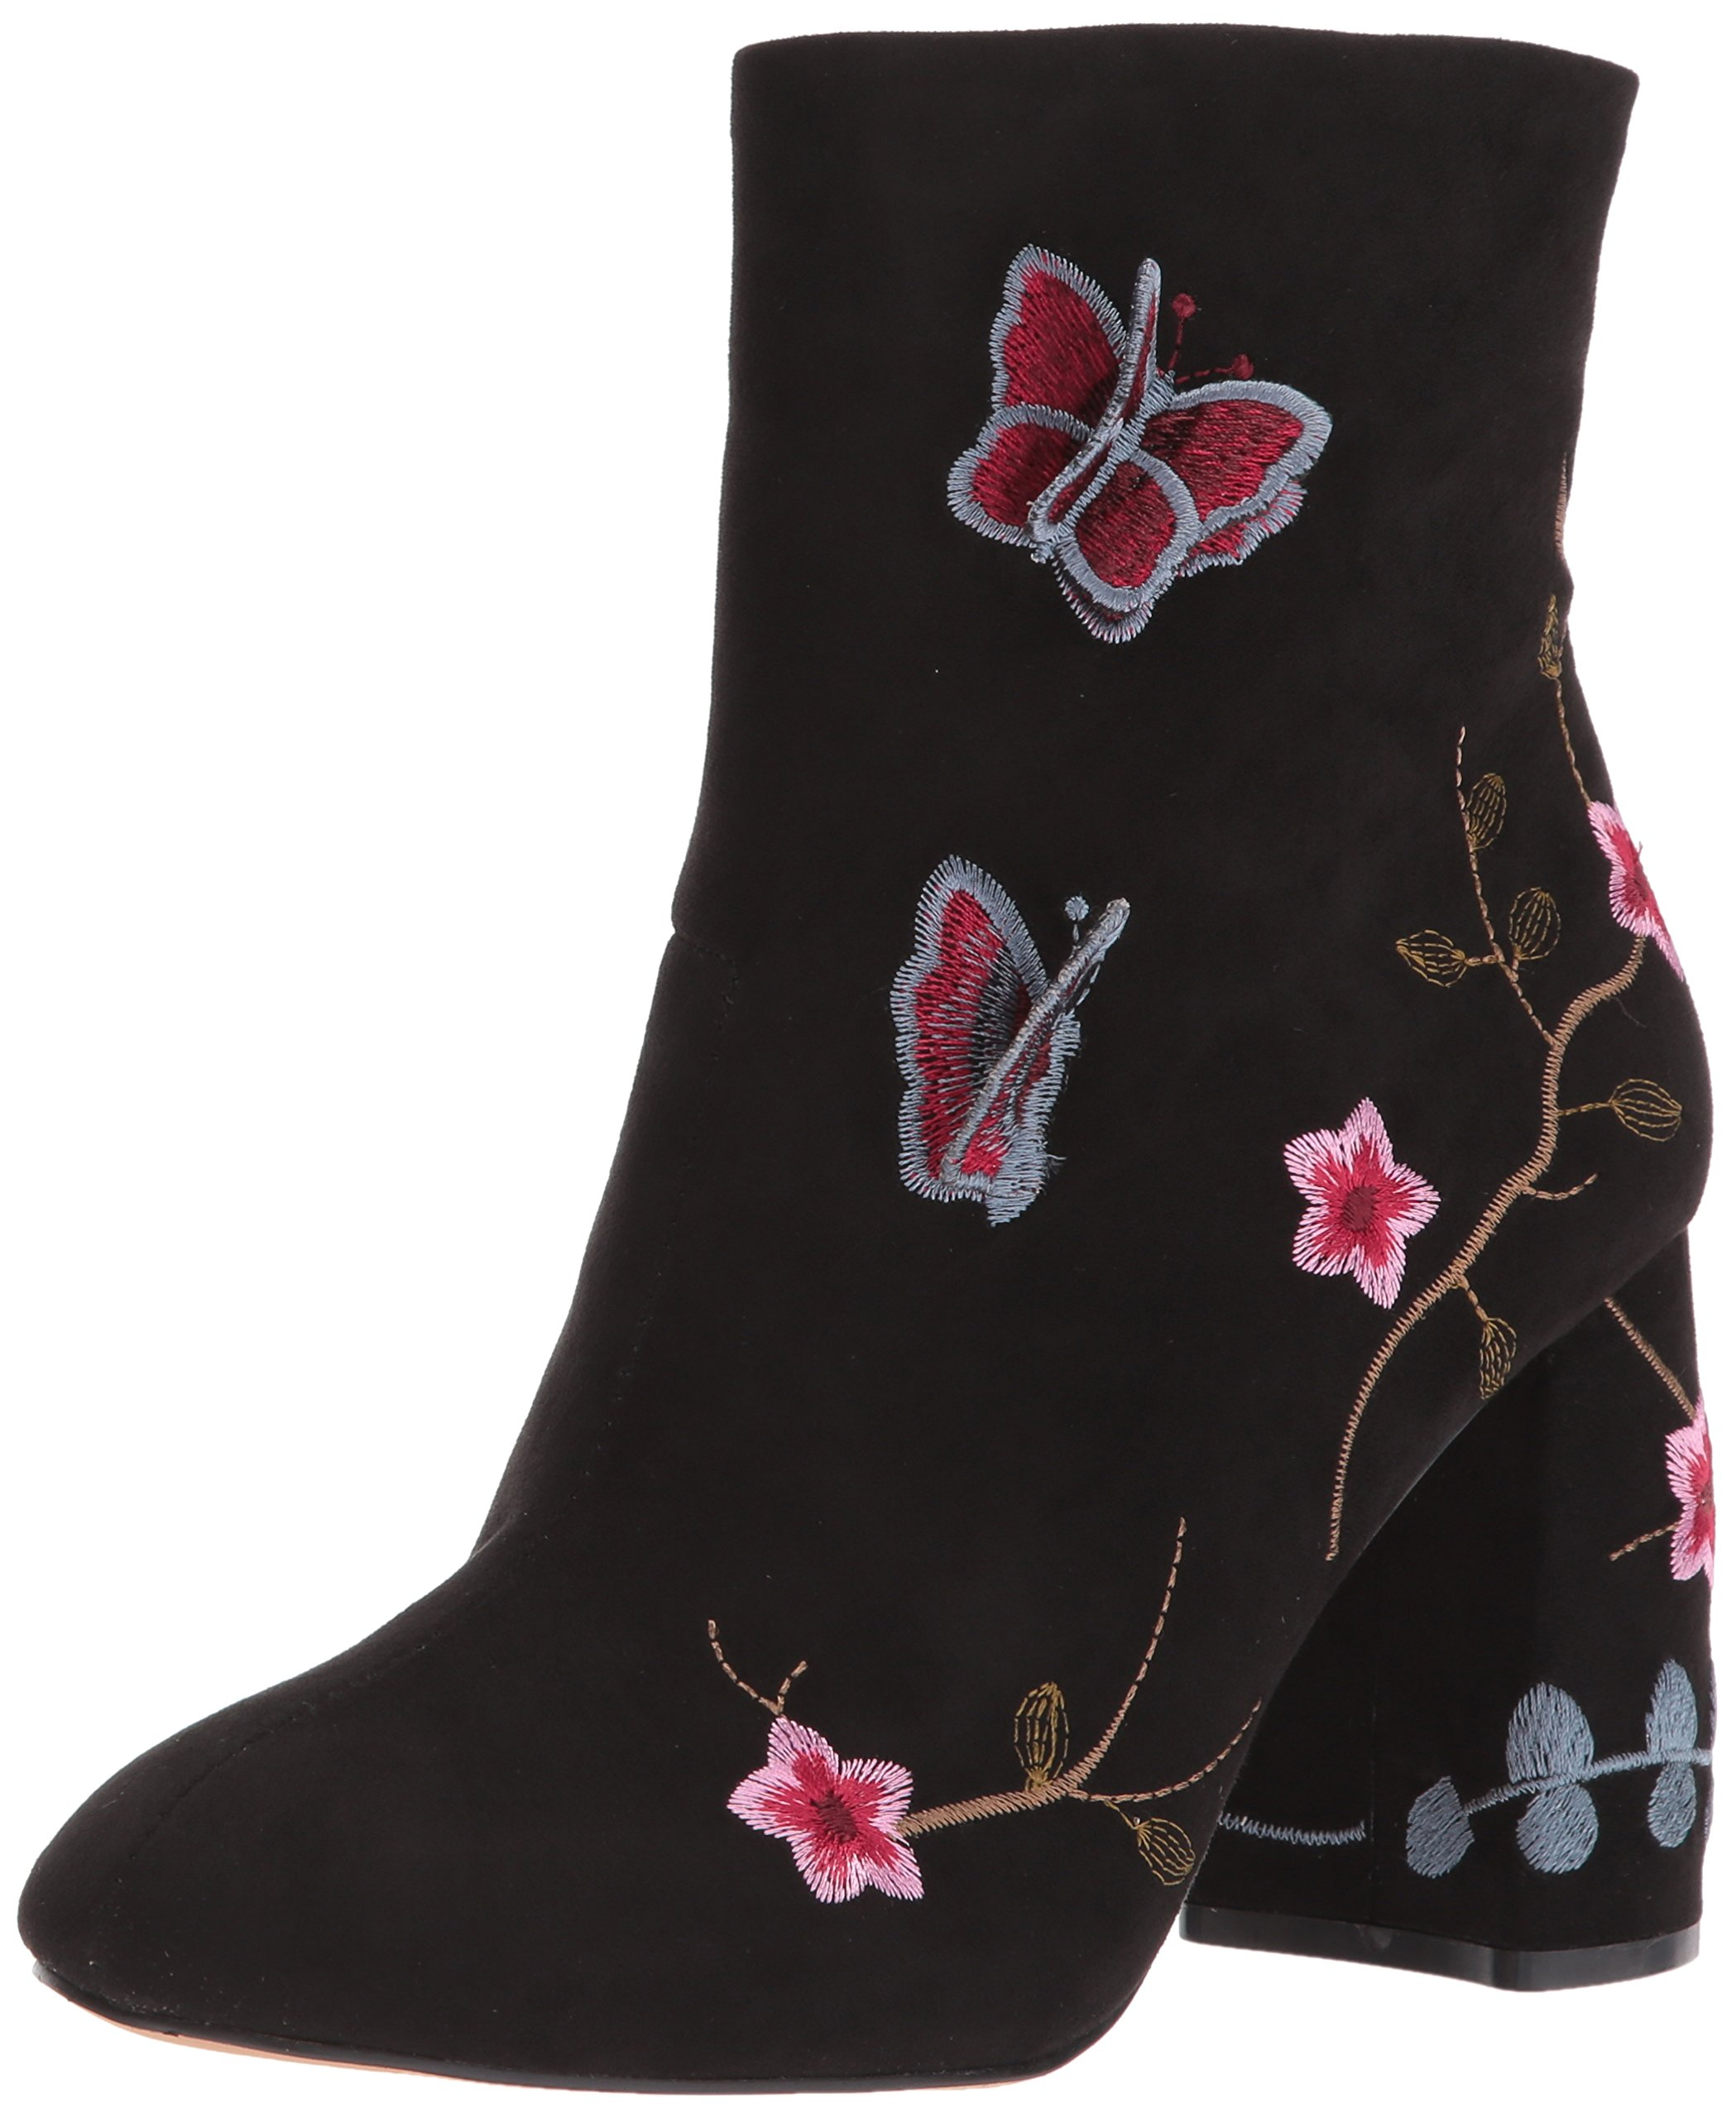 Nanette Lepore Women's Lilly Ankle Boot, Black, 7 M US